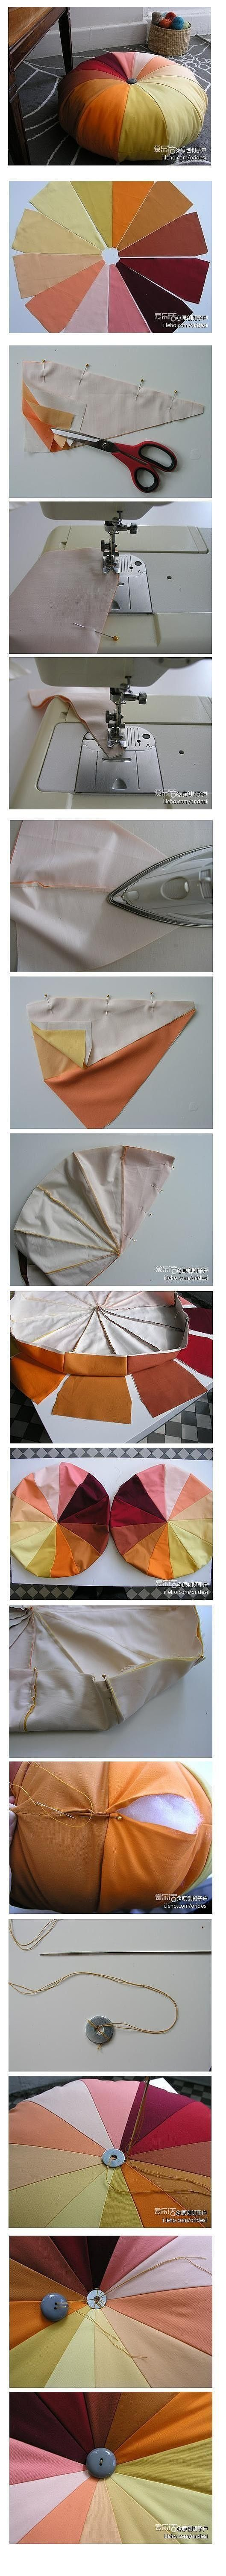 Really nice ottoman/pillow tutorial: